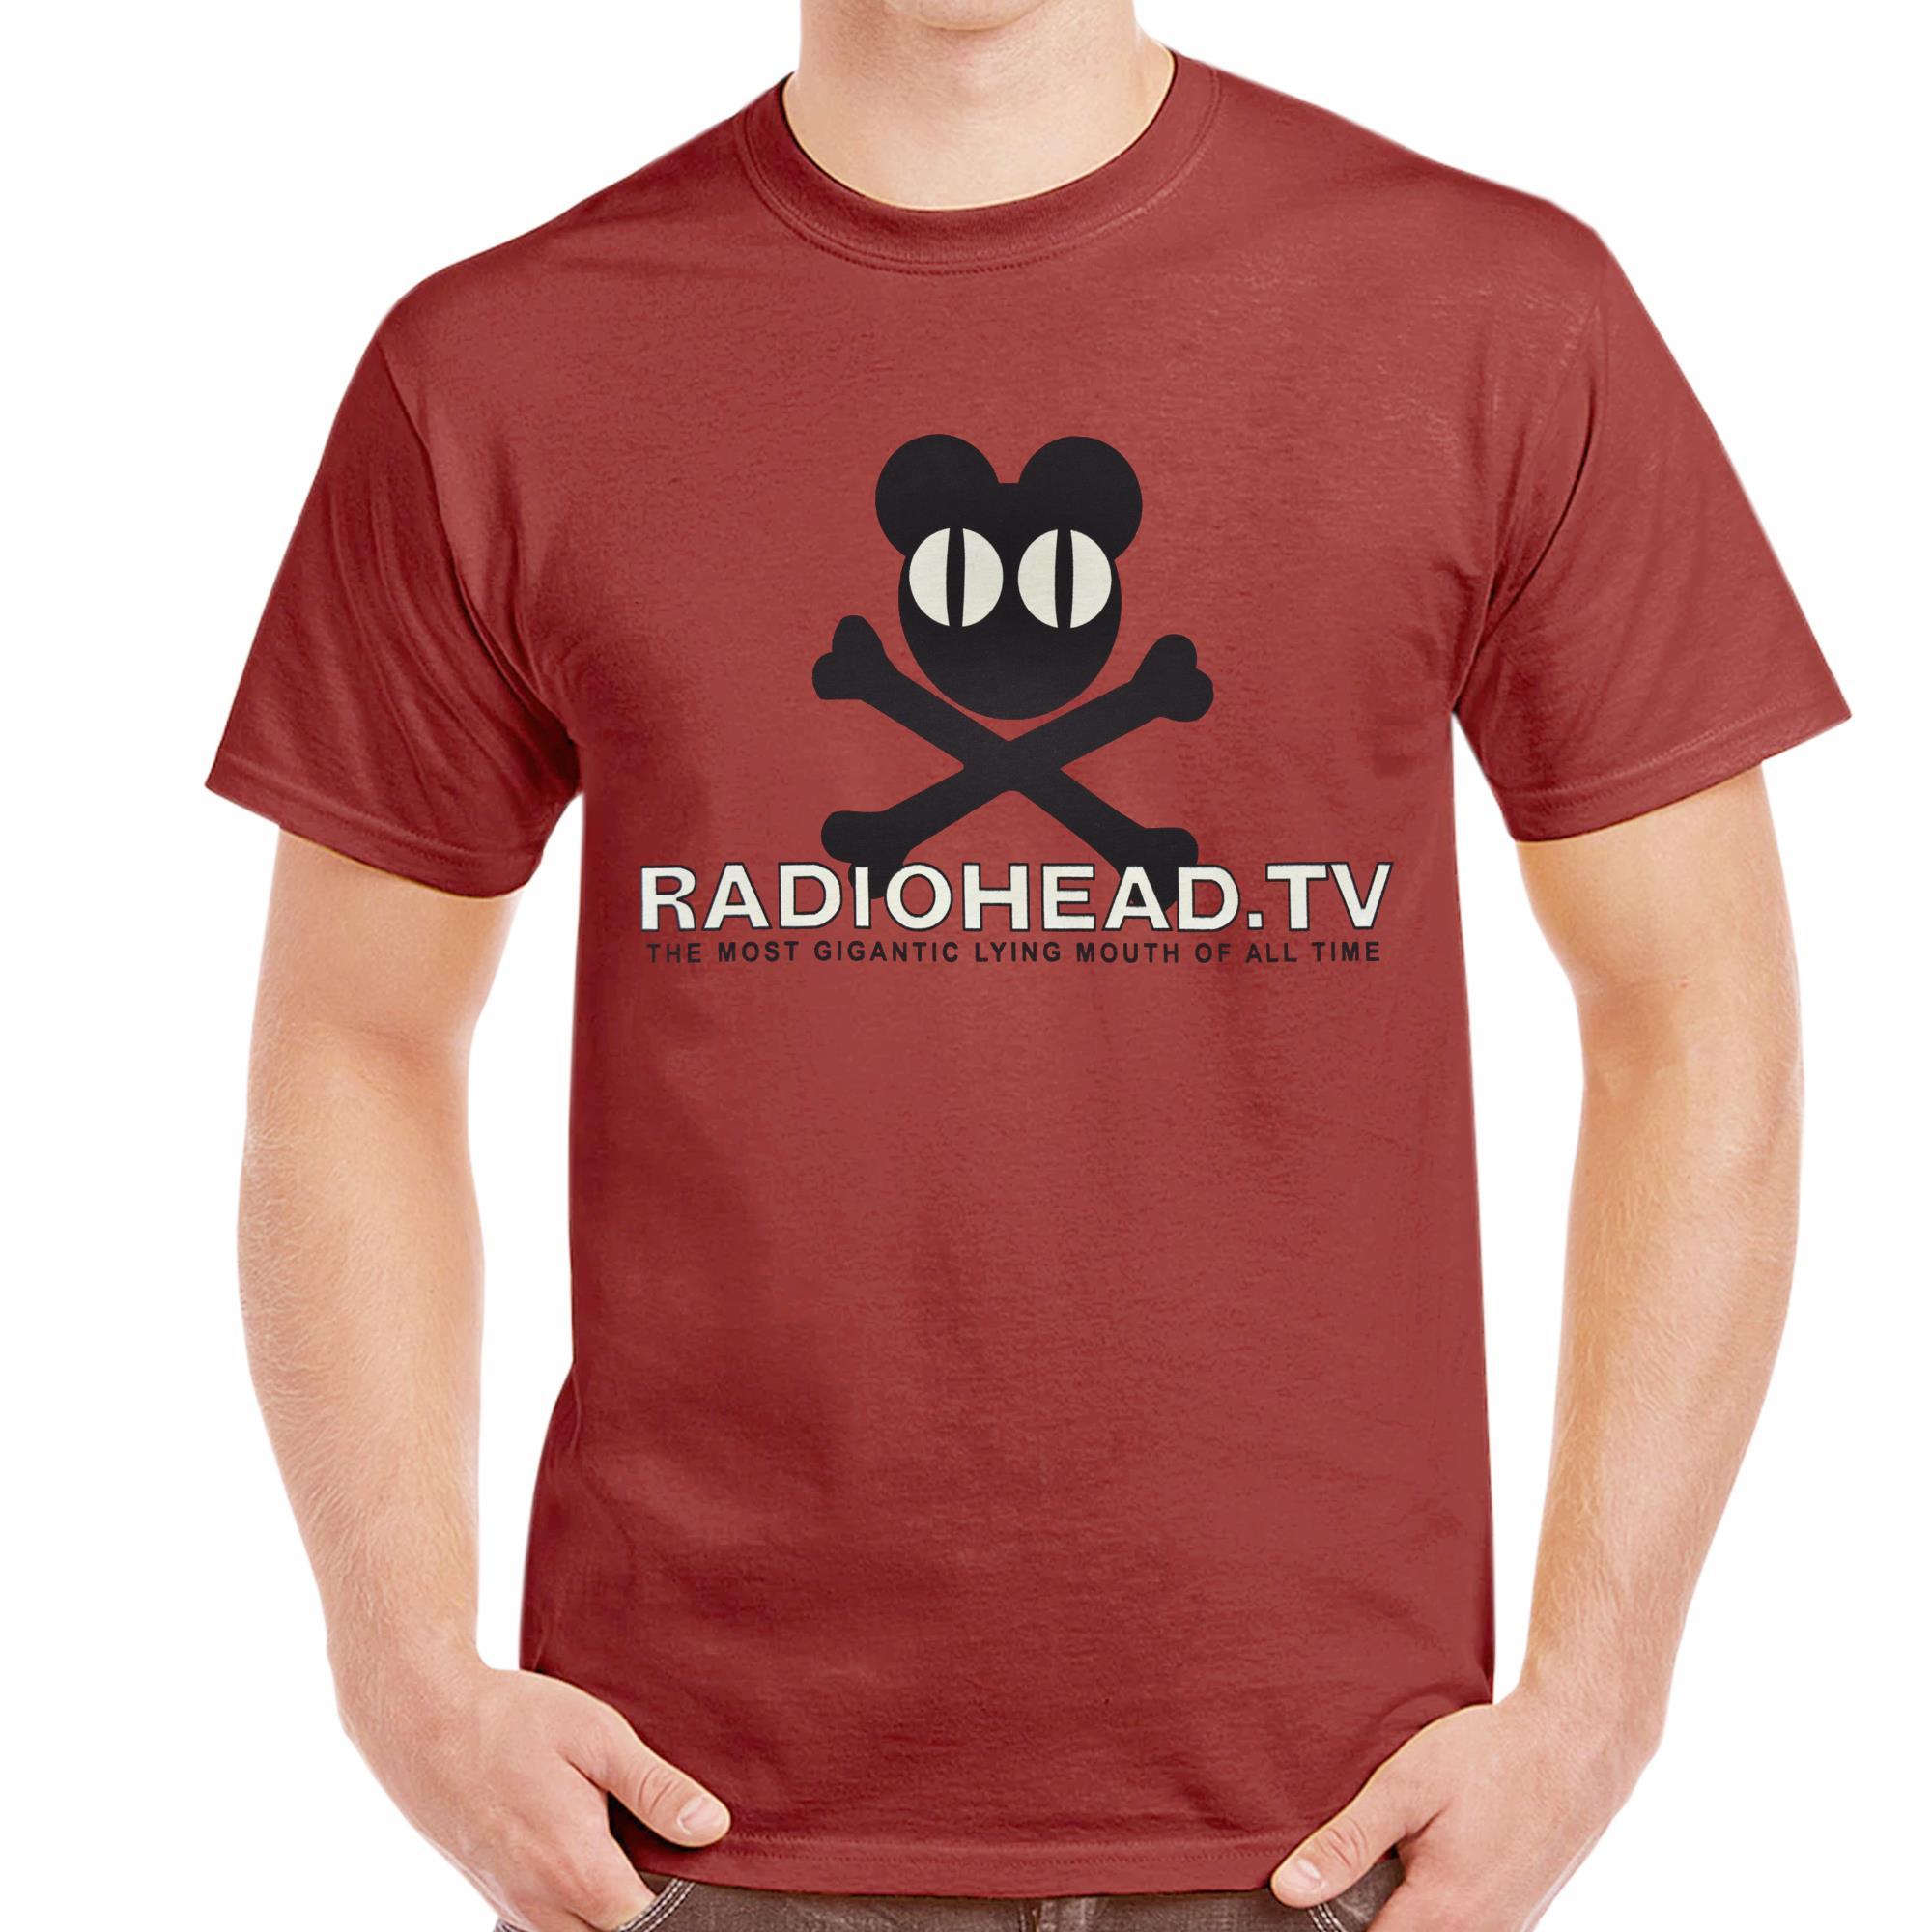 Radiohead.TV